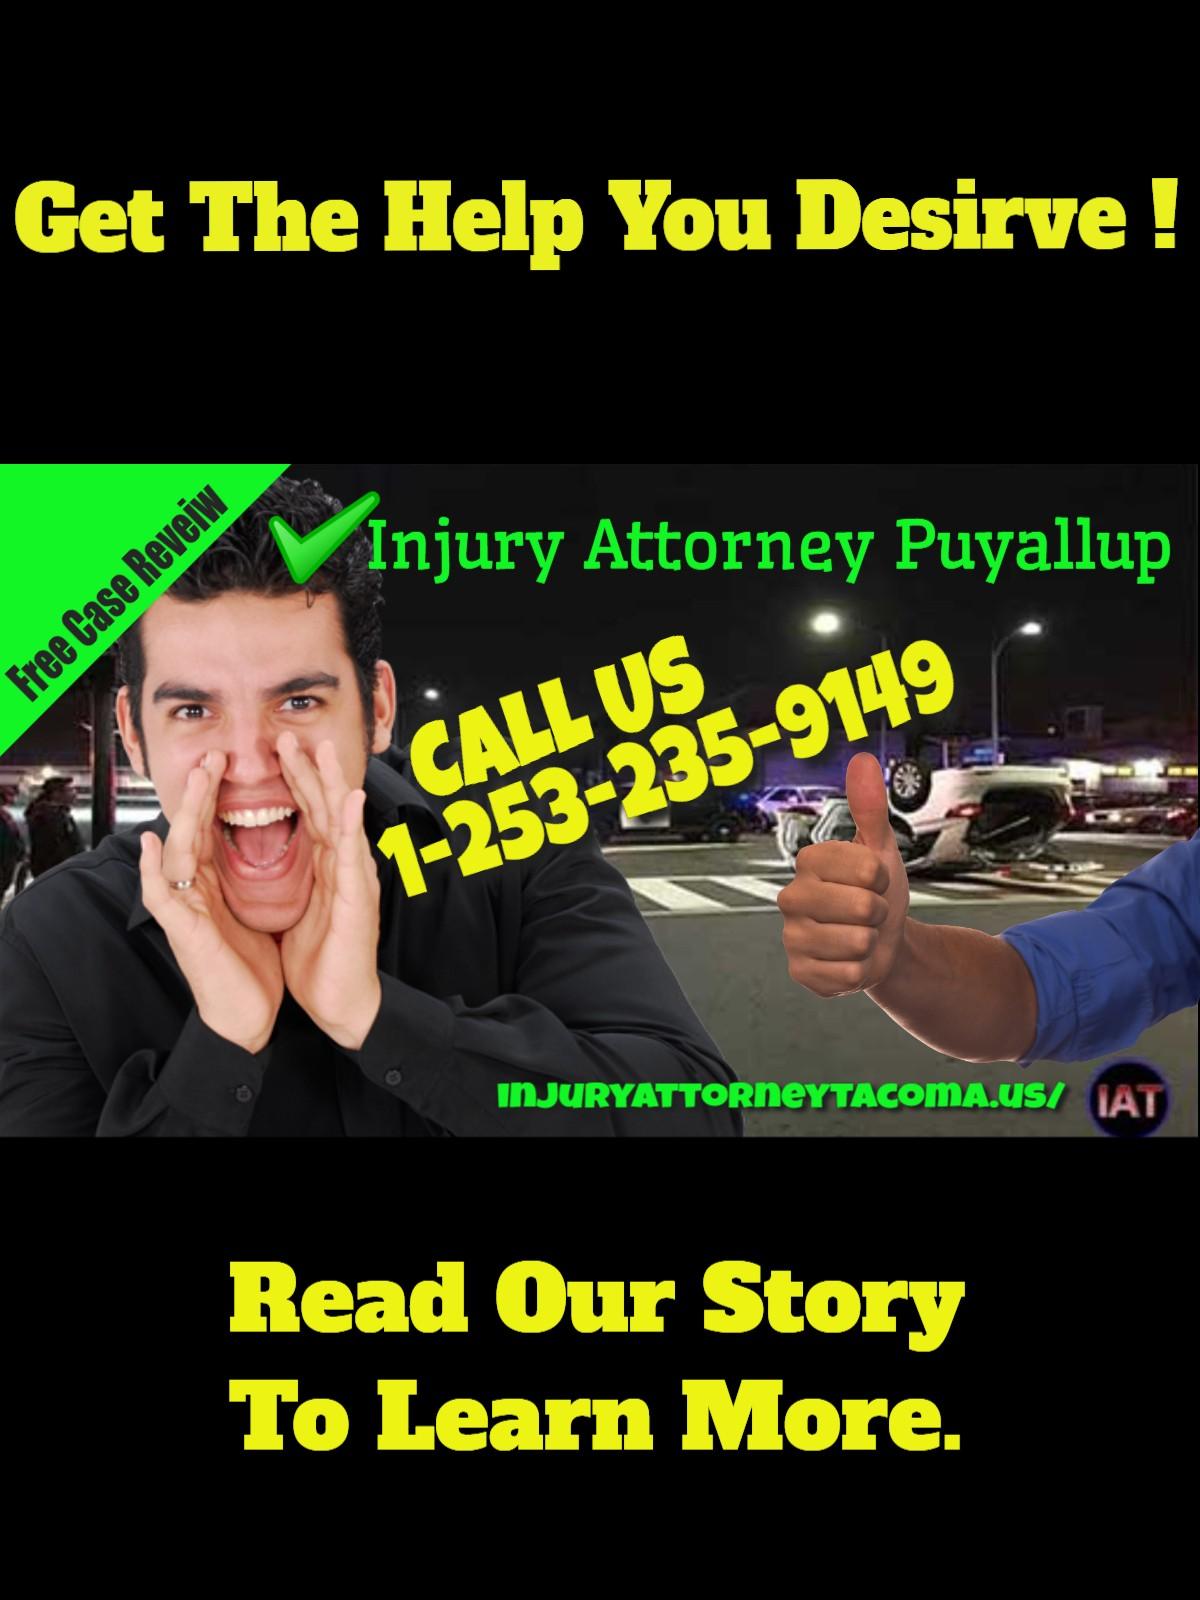 Injury Attorney Puyallup